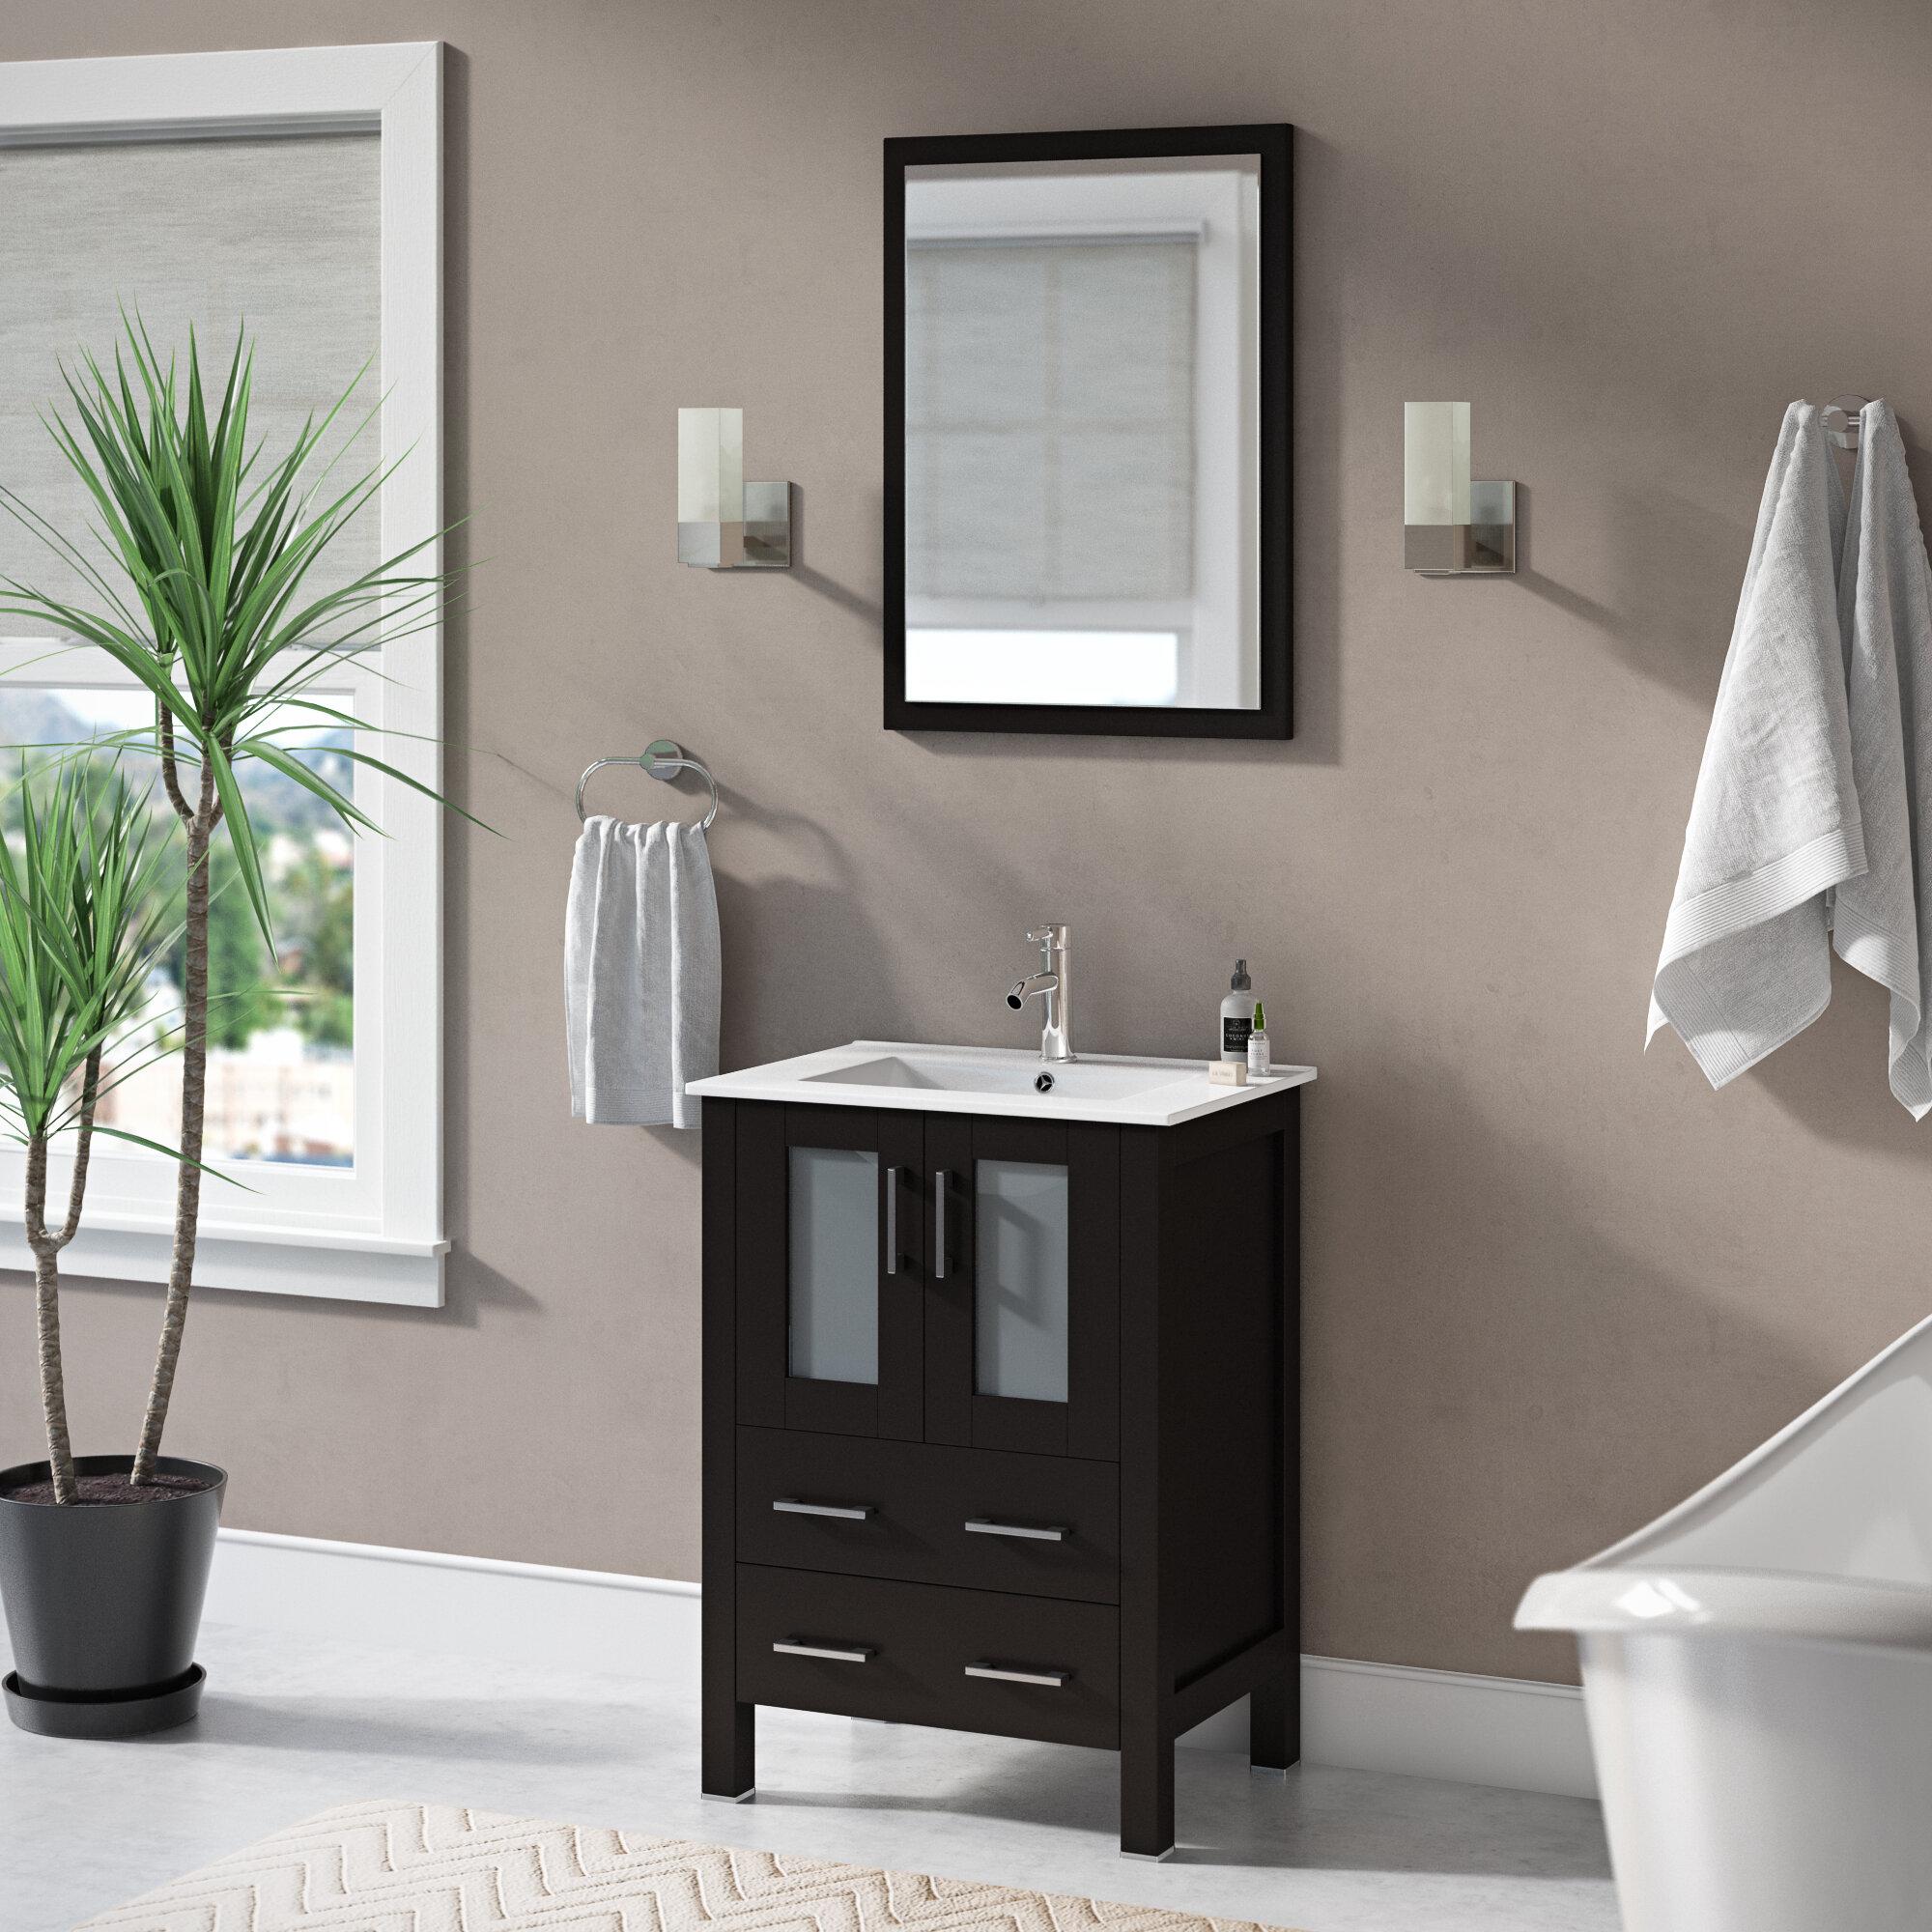 Netto 24 Single Bathroom Vanity Set With Mirror